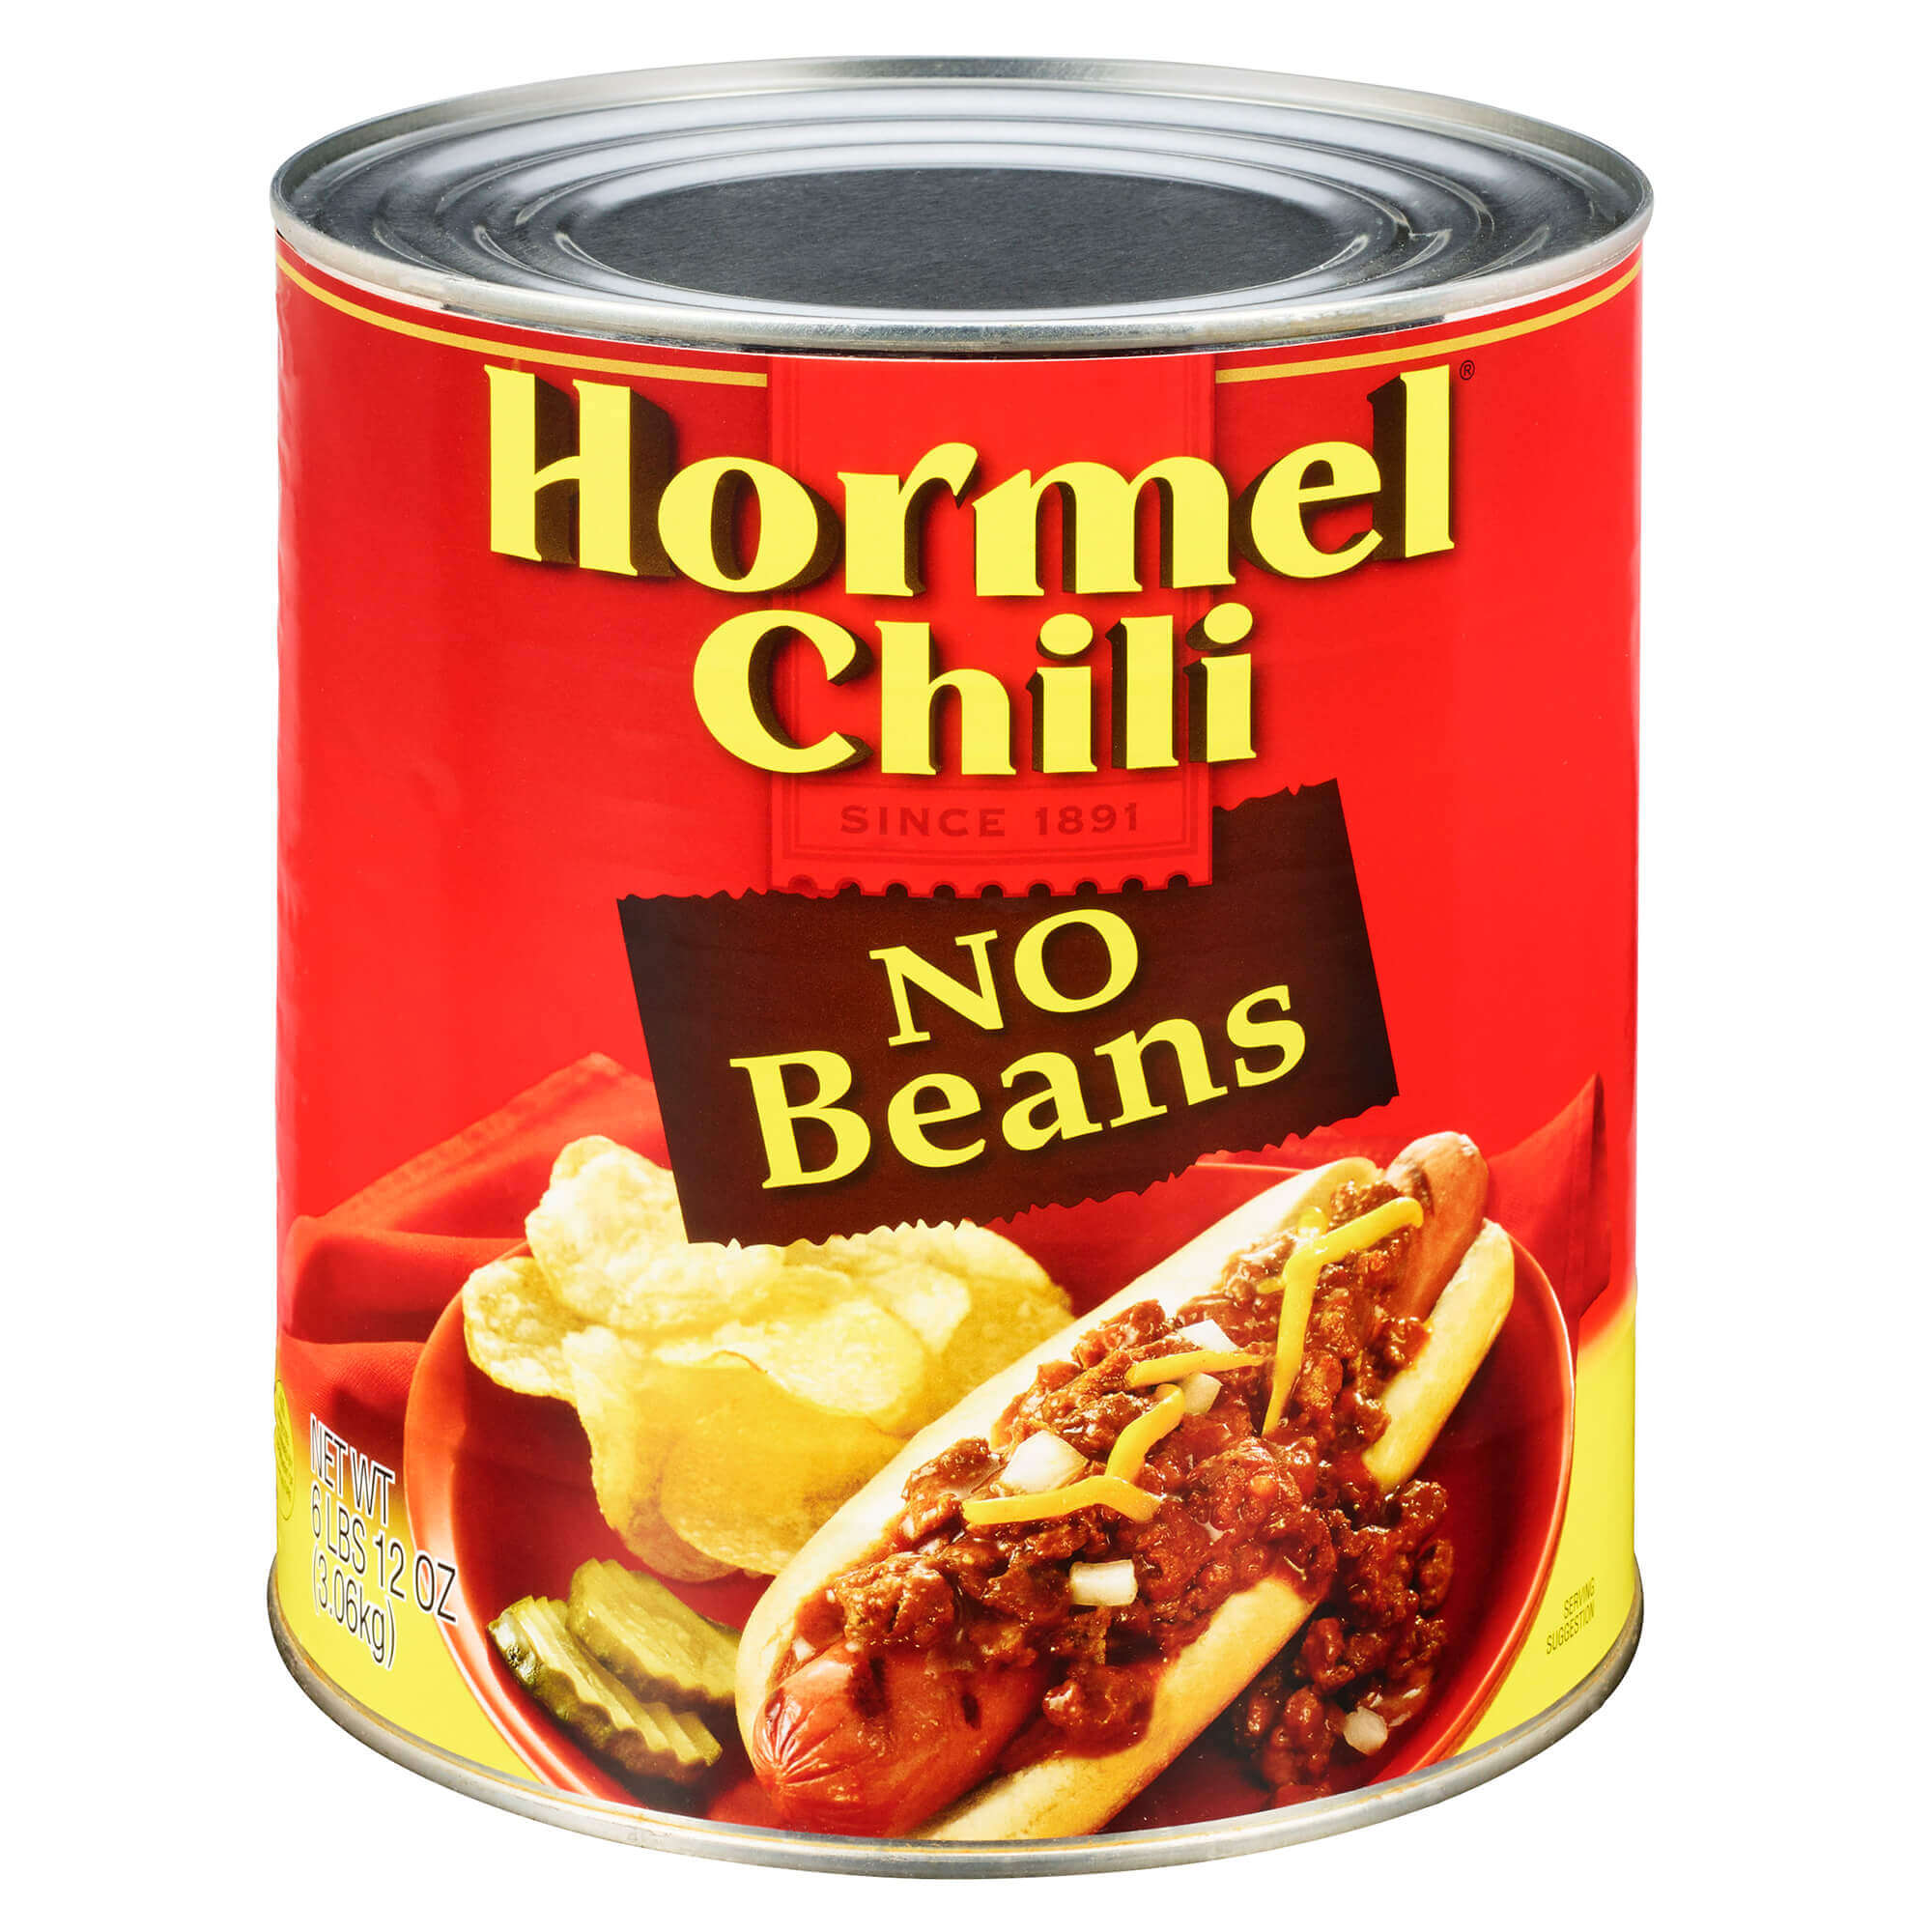 Hormel Chili No Beans, 108 Ounce